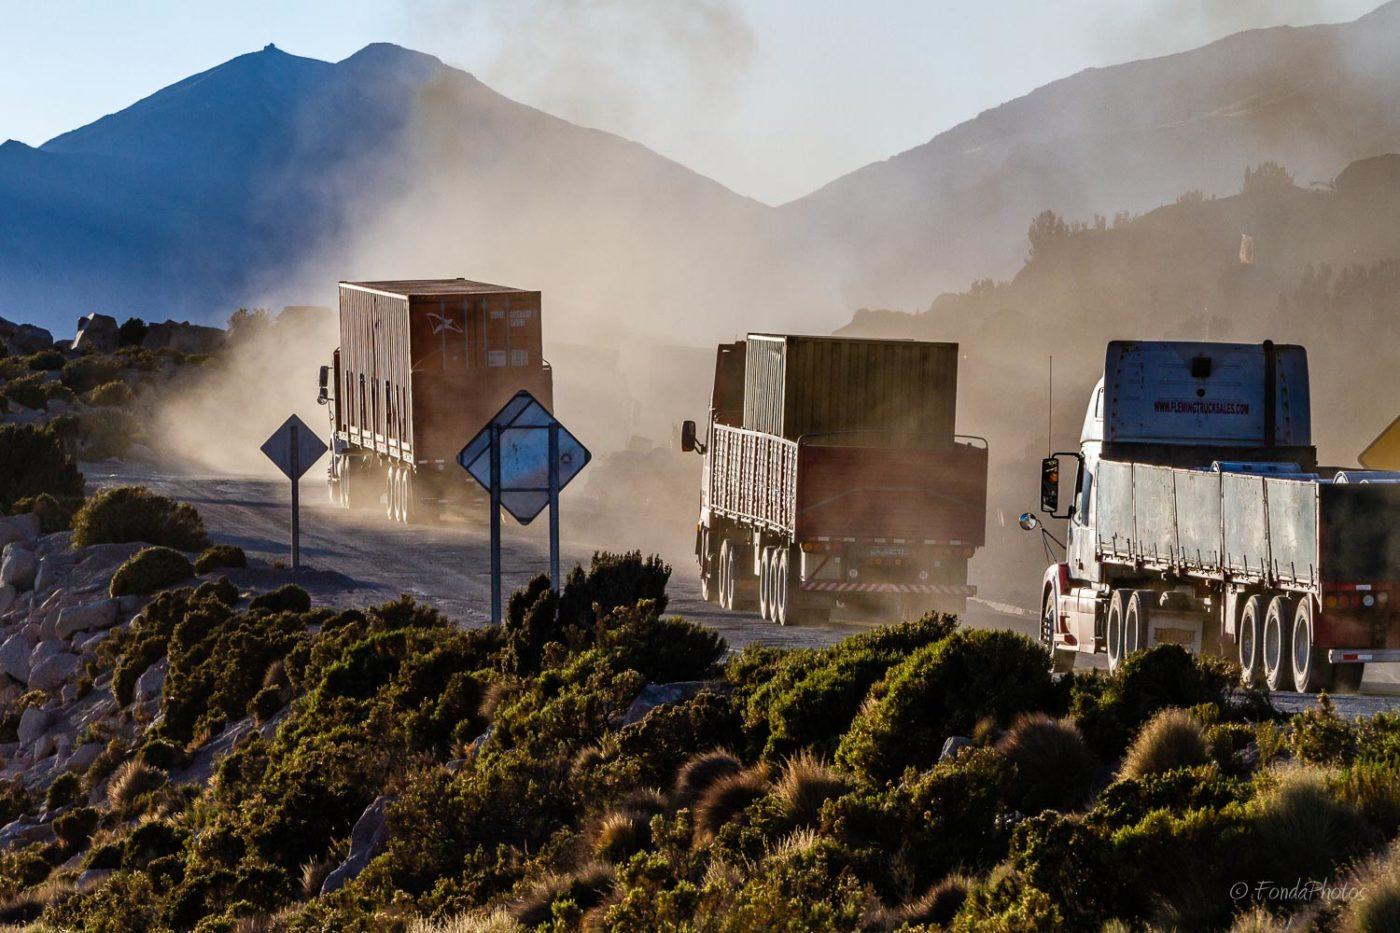 Trucks on Route 11 towards Bolivia